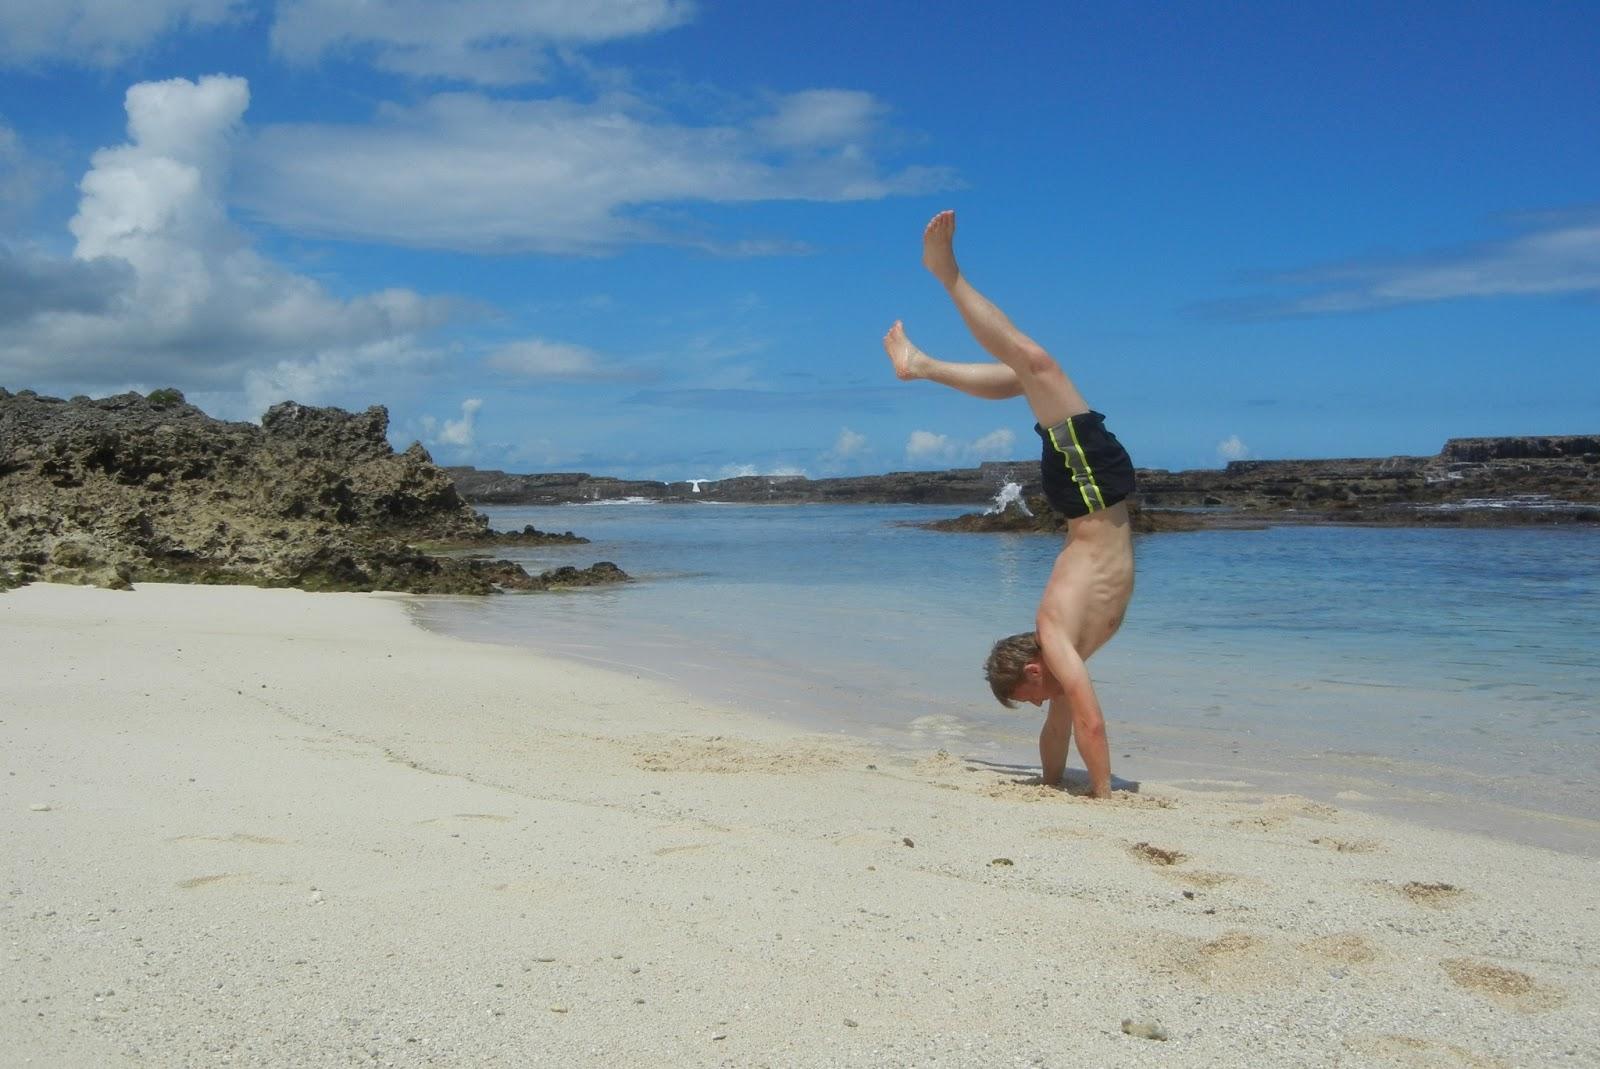 Gunnar Garfors em Tonga, Oceania